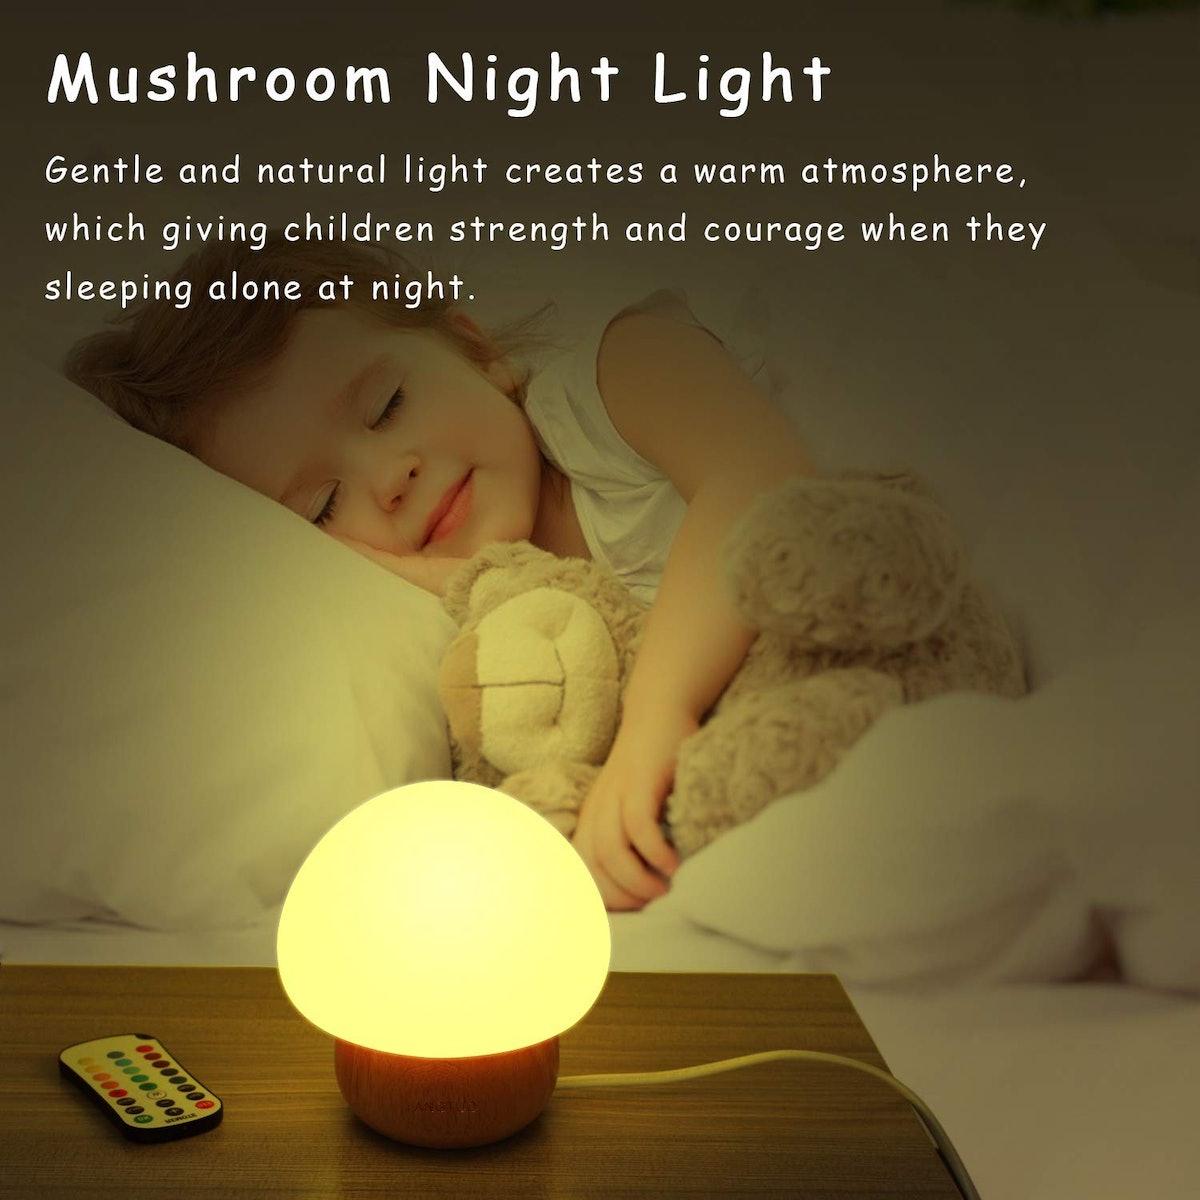 ANGTUO LED Mushroom Night Light